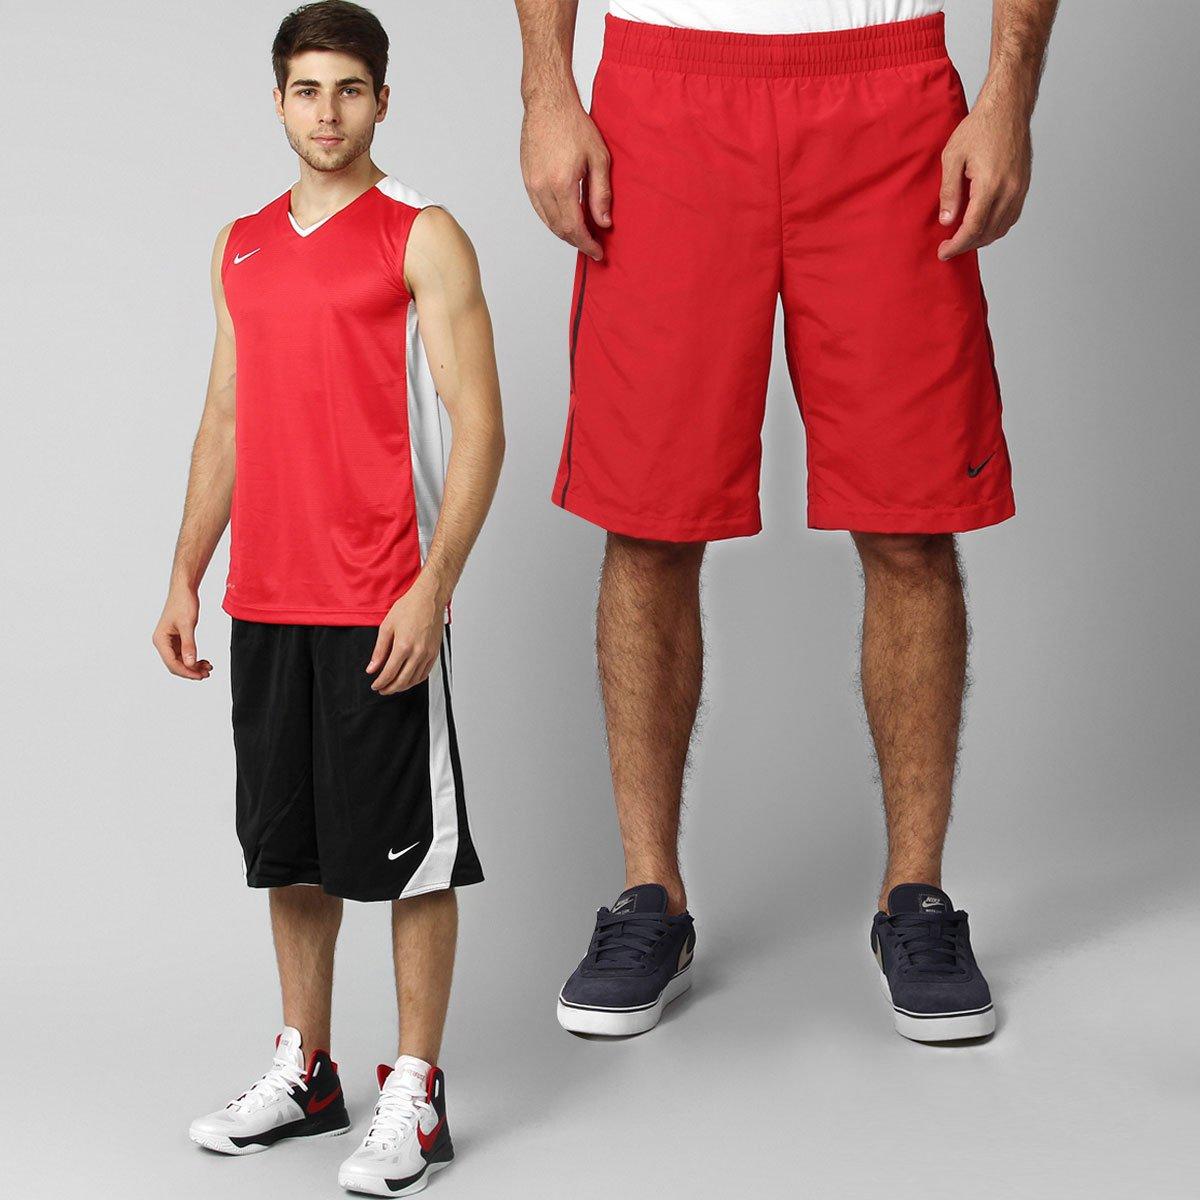 41ec1cc623 Kit - Camiseta Regata Nike Post Up + Bermuda Nike Básica AD - Compre Agora